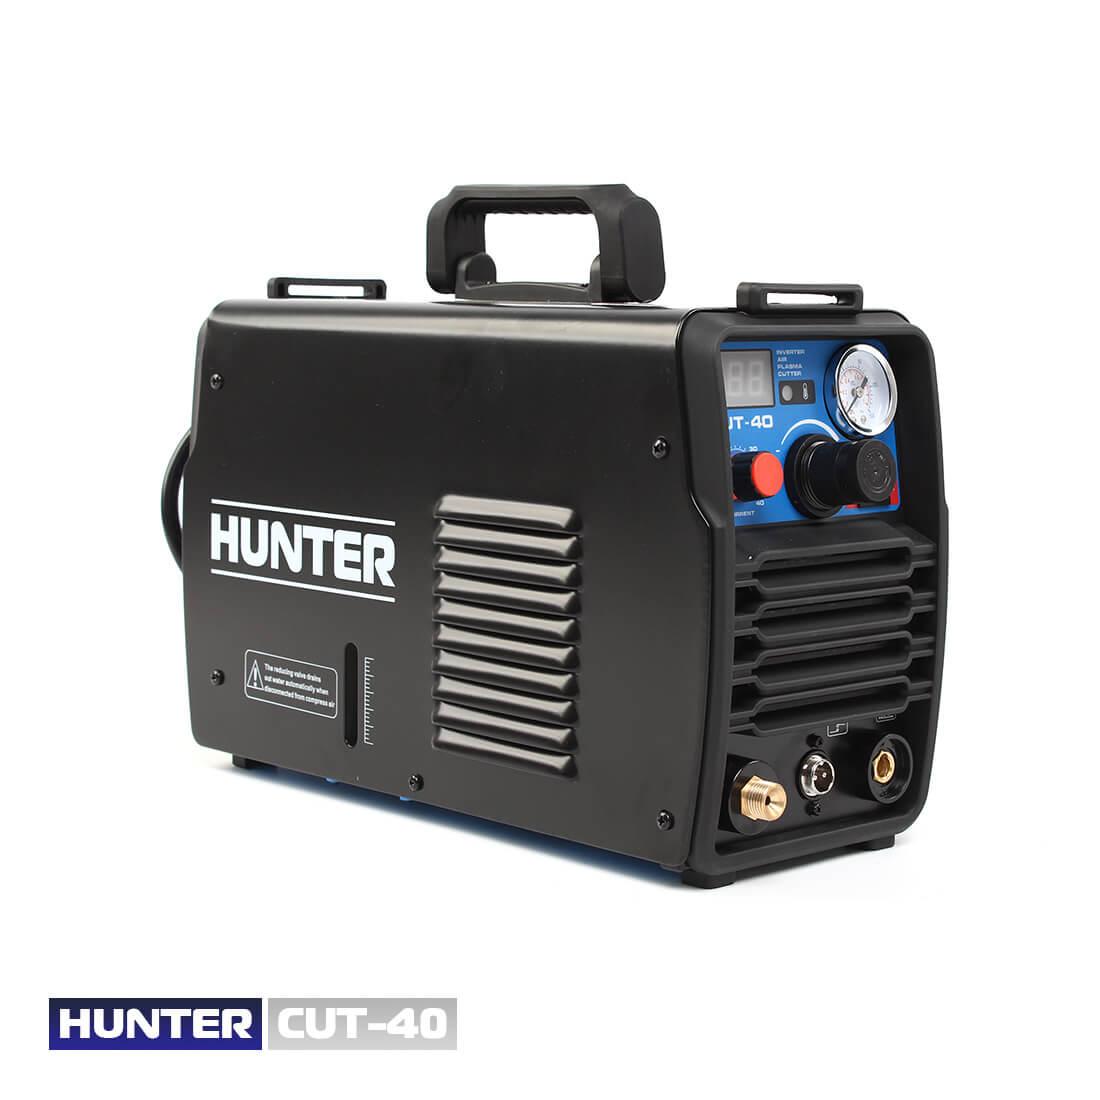 Фото Hunter CUT-40 (плазморез) цена 6350грн №1 — Hunter